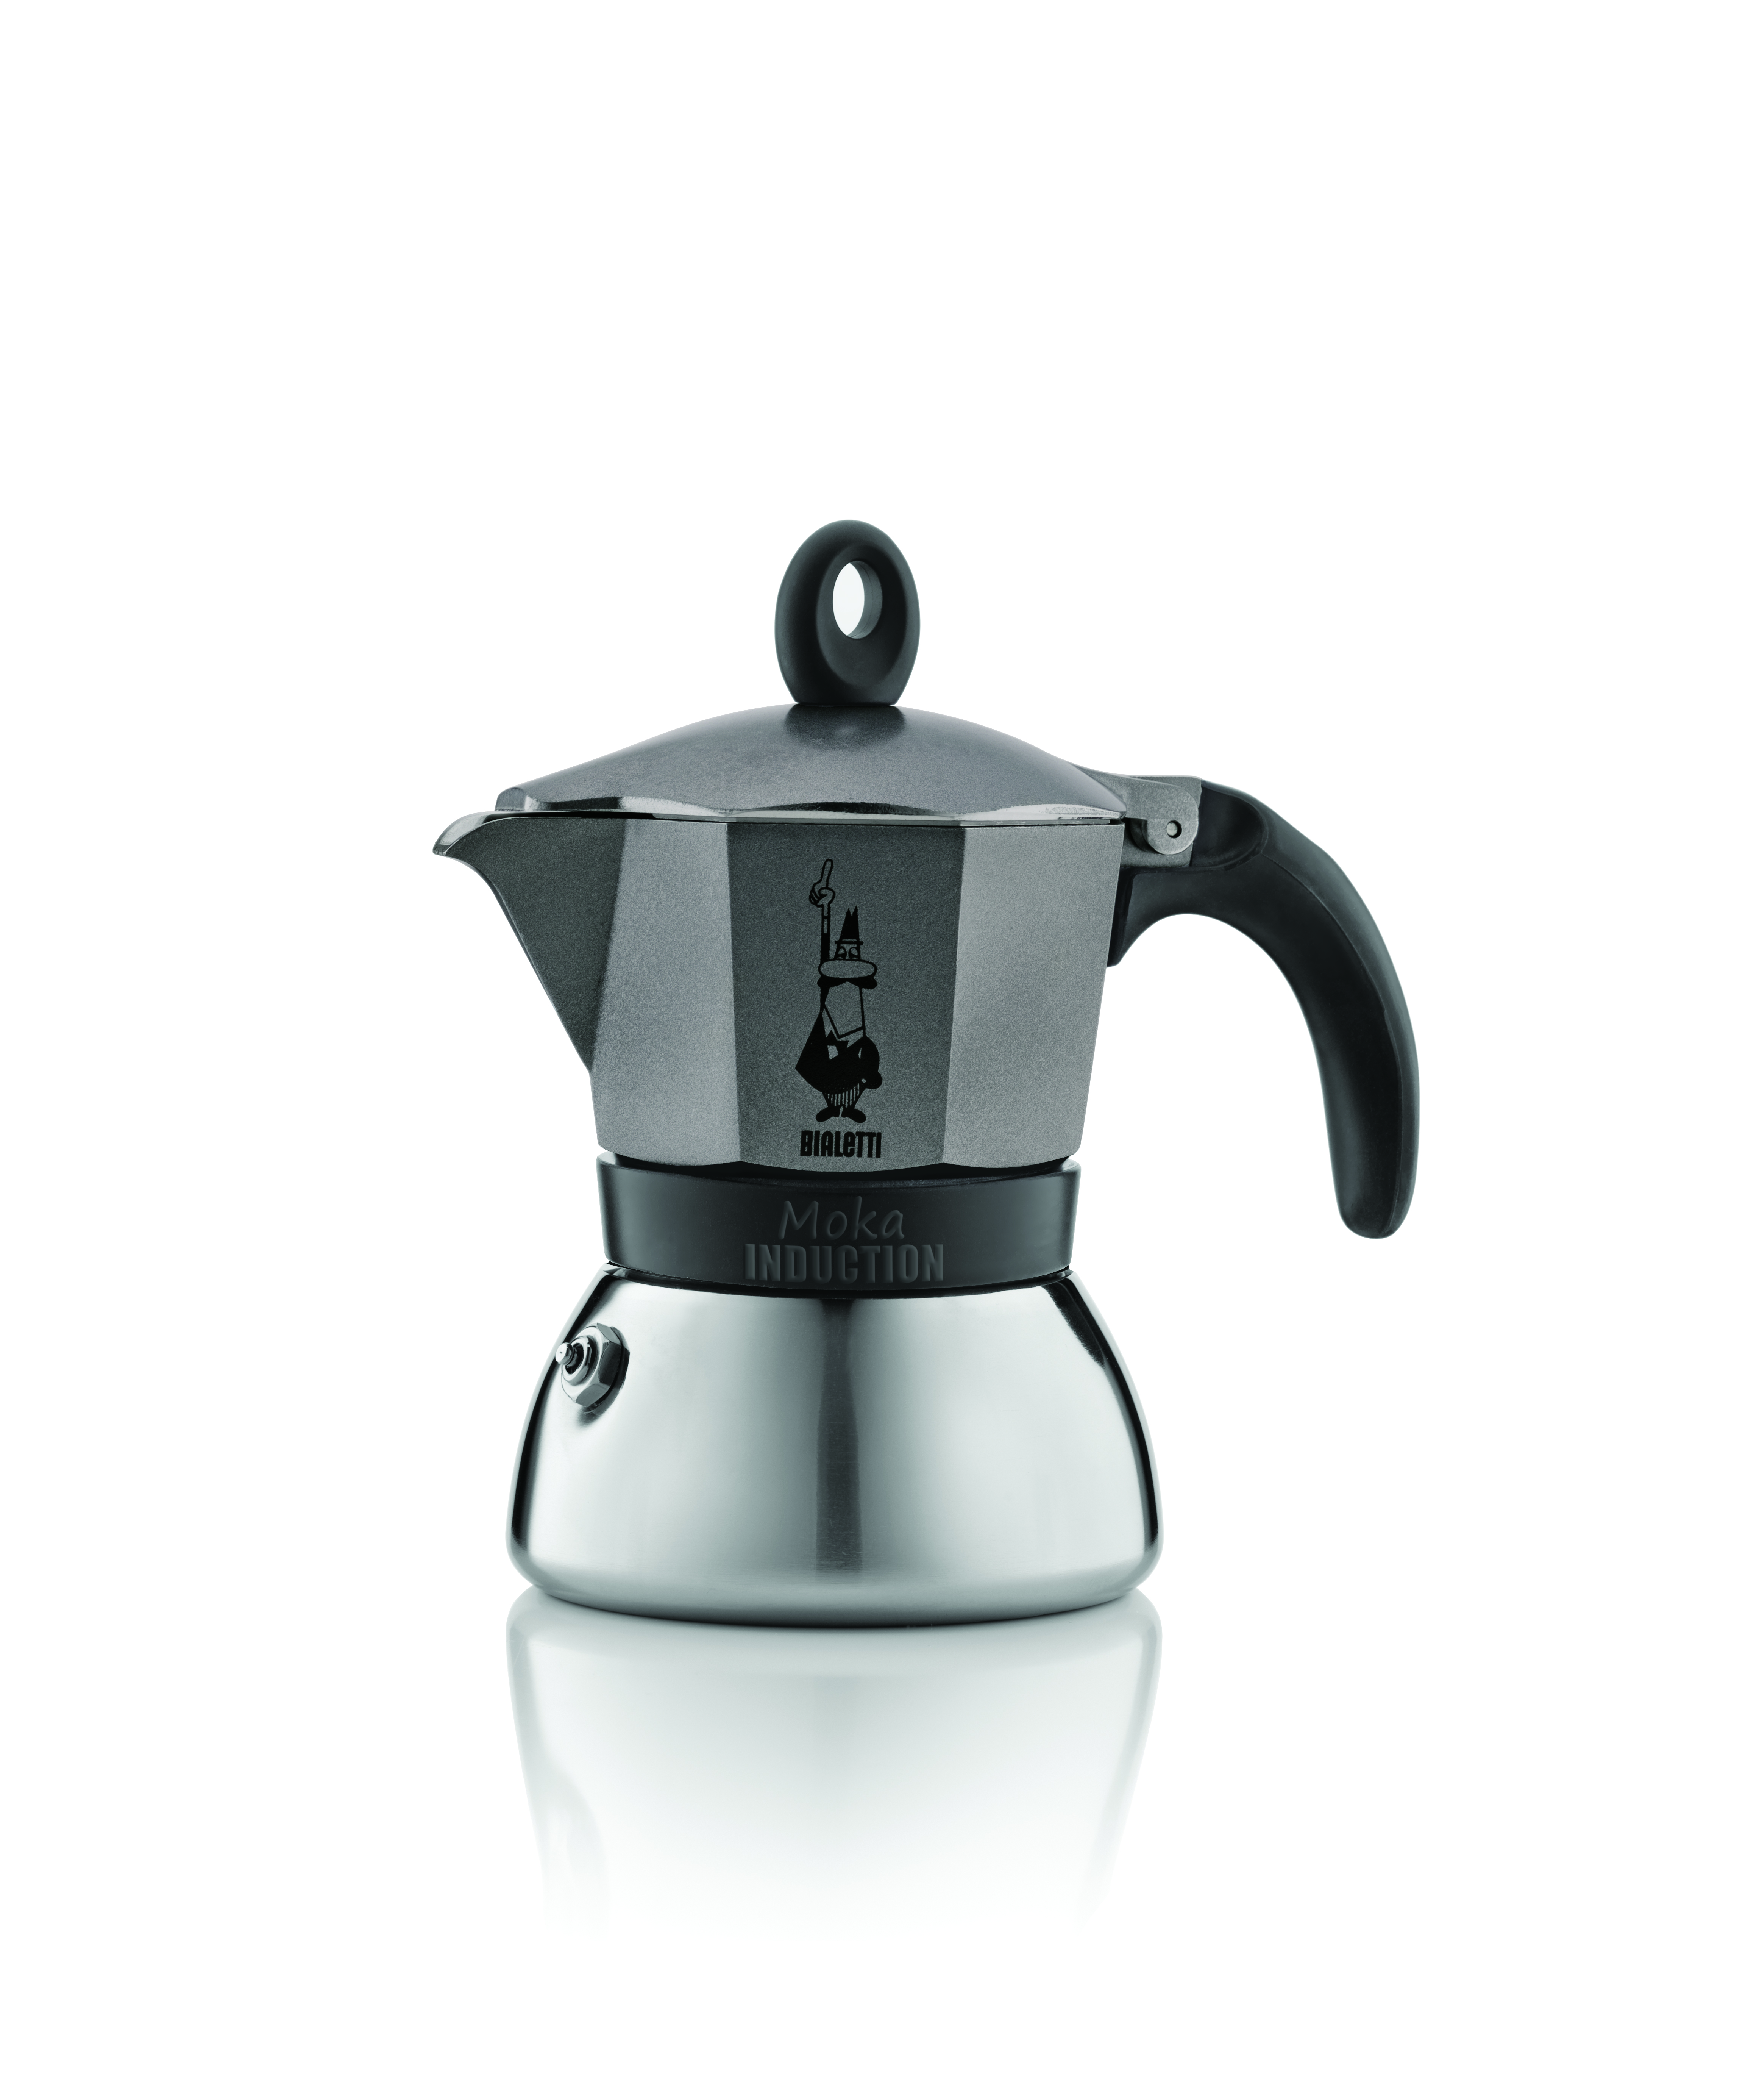 Кофеварка Bialetti Moka Induzione antracite 6 п. 4823Кофеварки и кофемашины<br><br><br>Тип : гейзерная кофеварка<br>Тип используемого кофе: Молотый<br>Объем, л: 0,24<br>Материал корпуса  : Металл